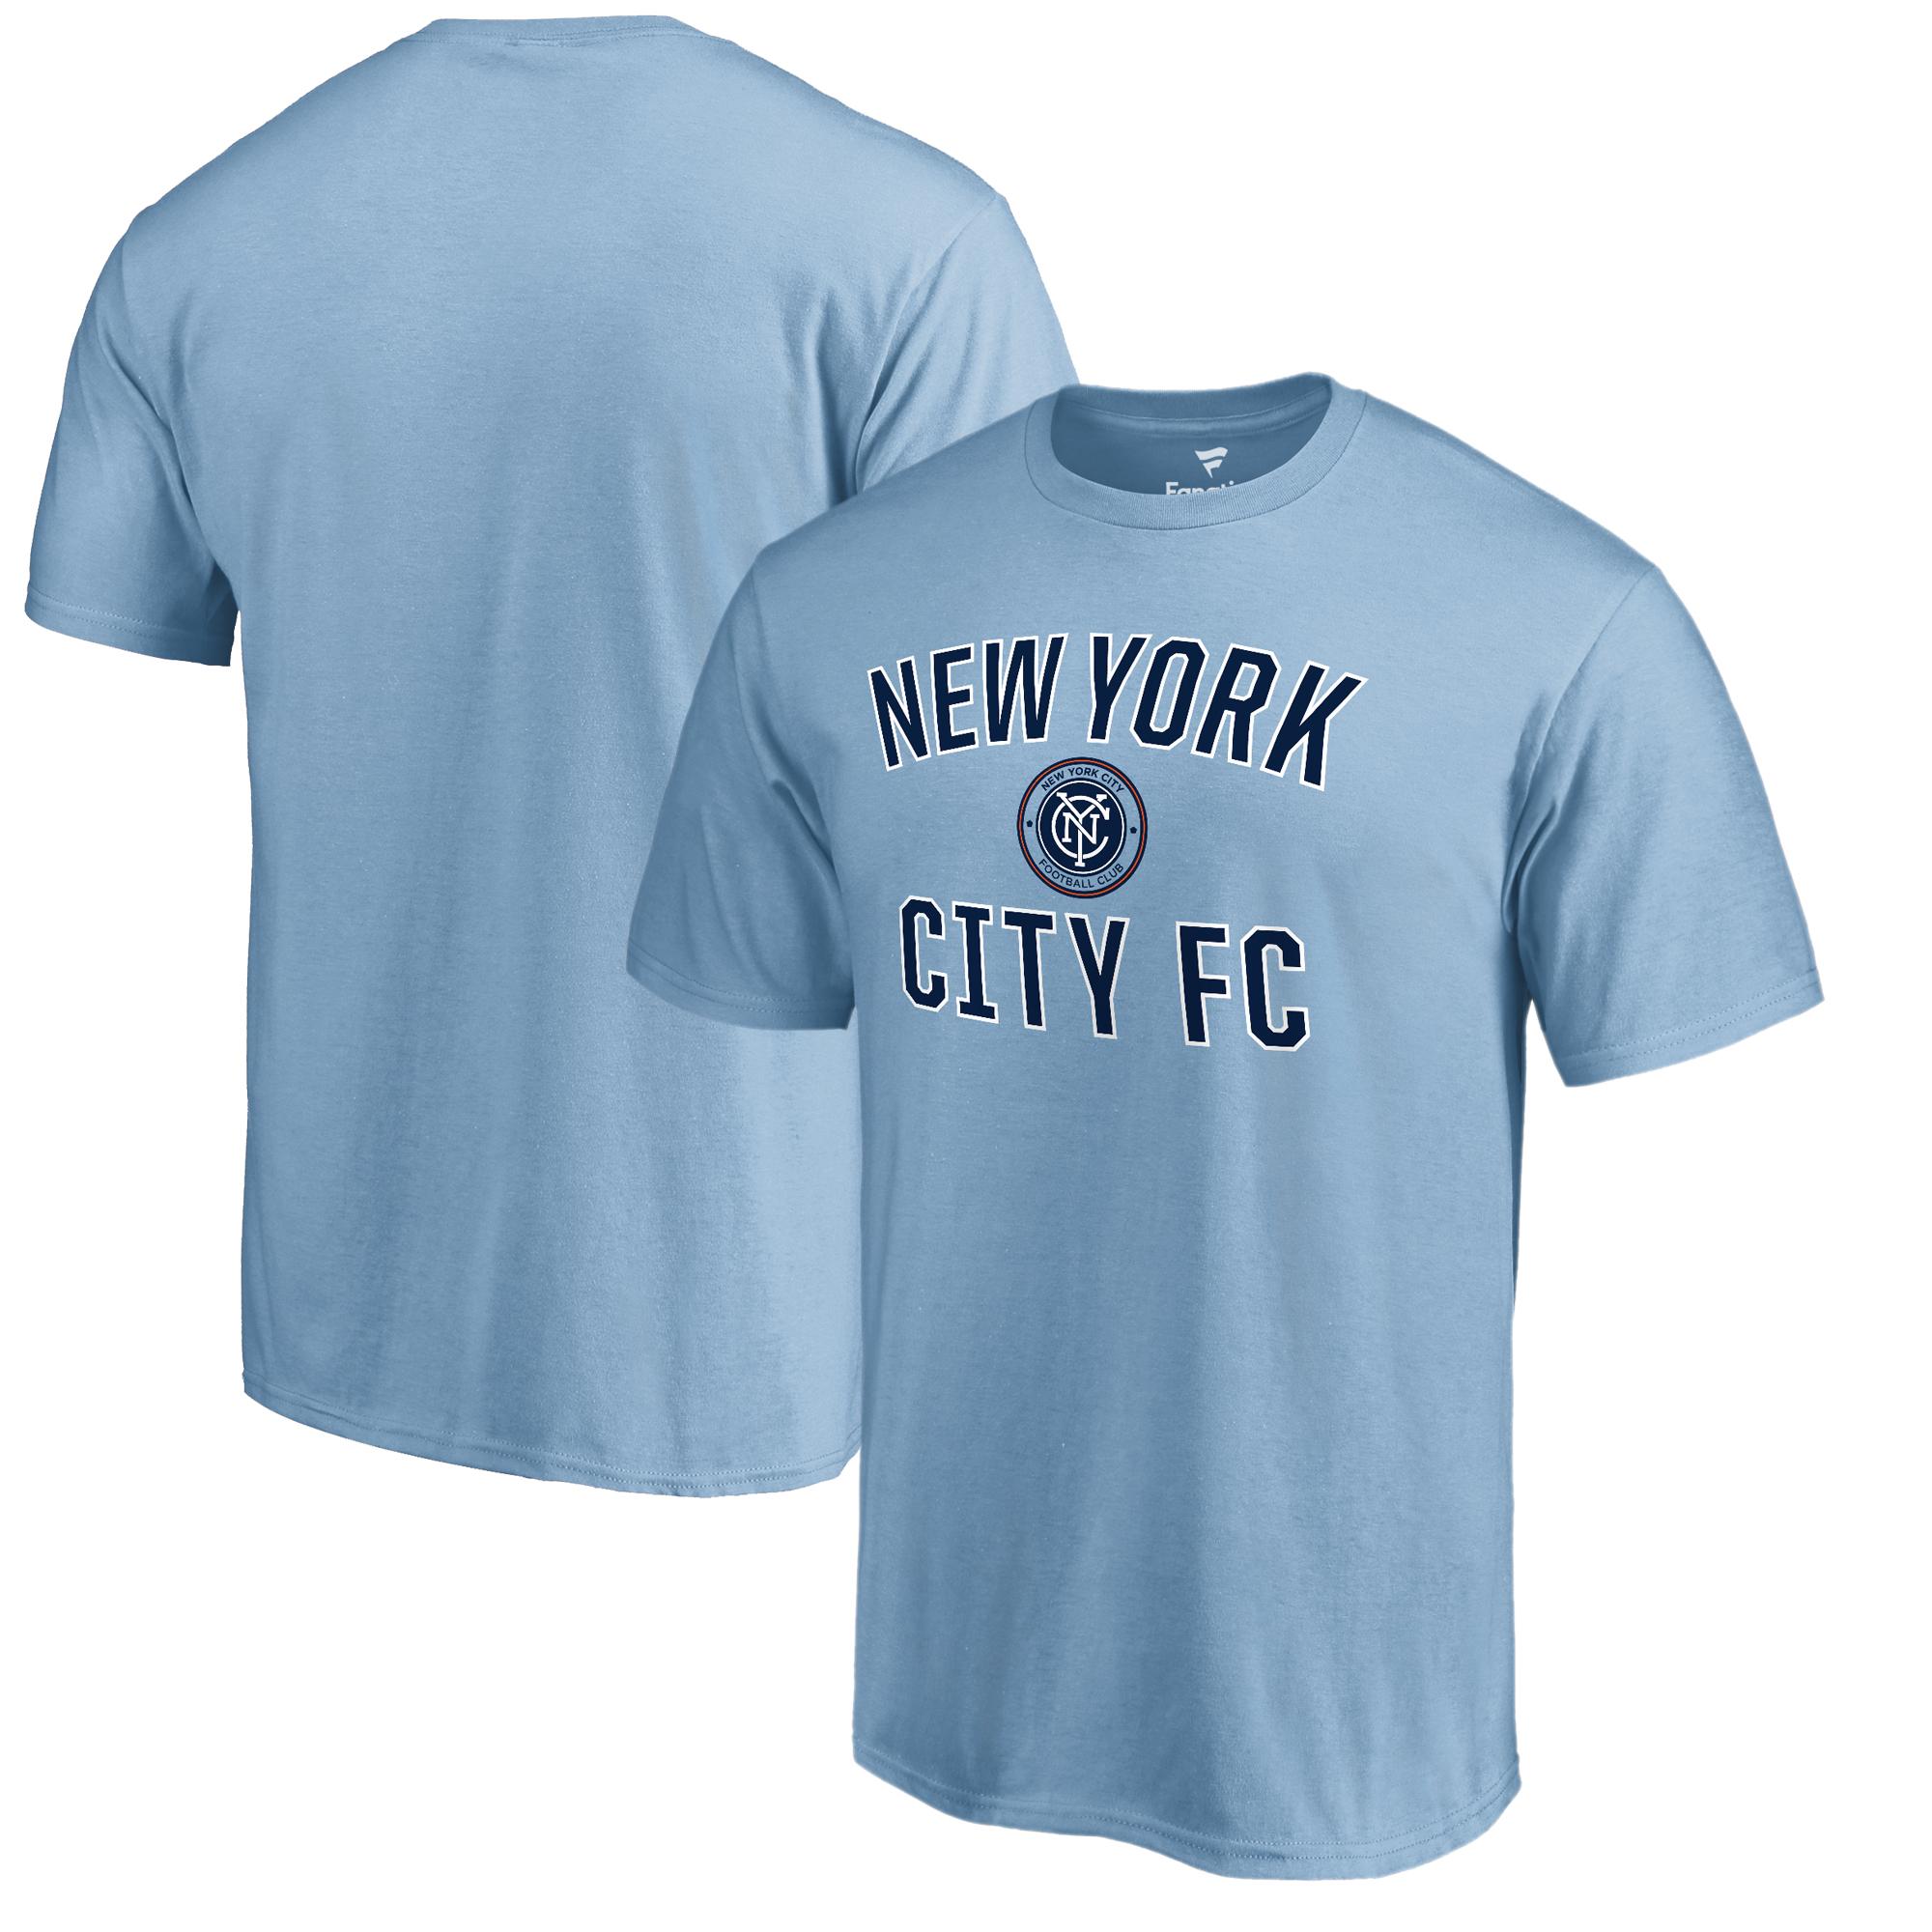 New York City FC Fanatics Branded Victory Arch Logo T-Shirt - Light Blue